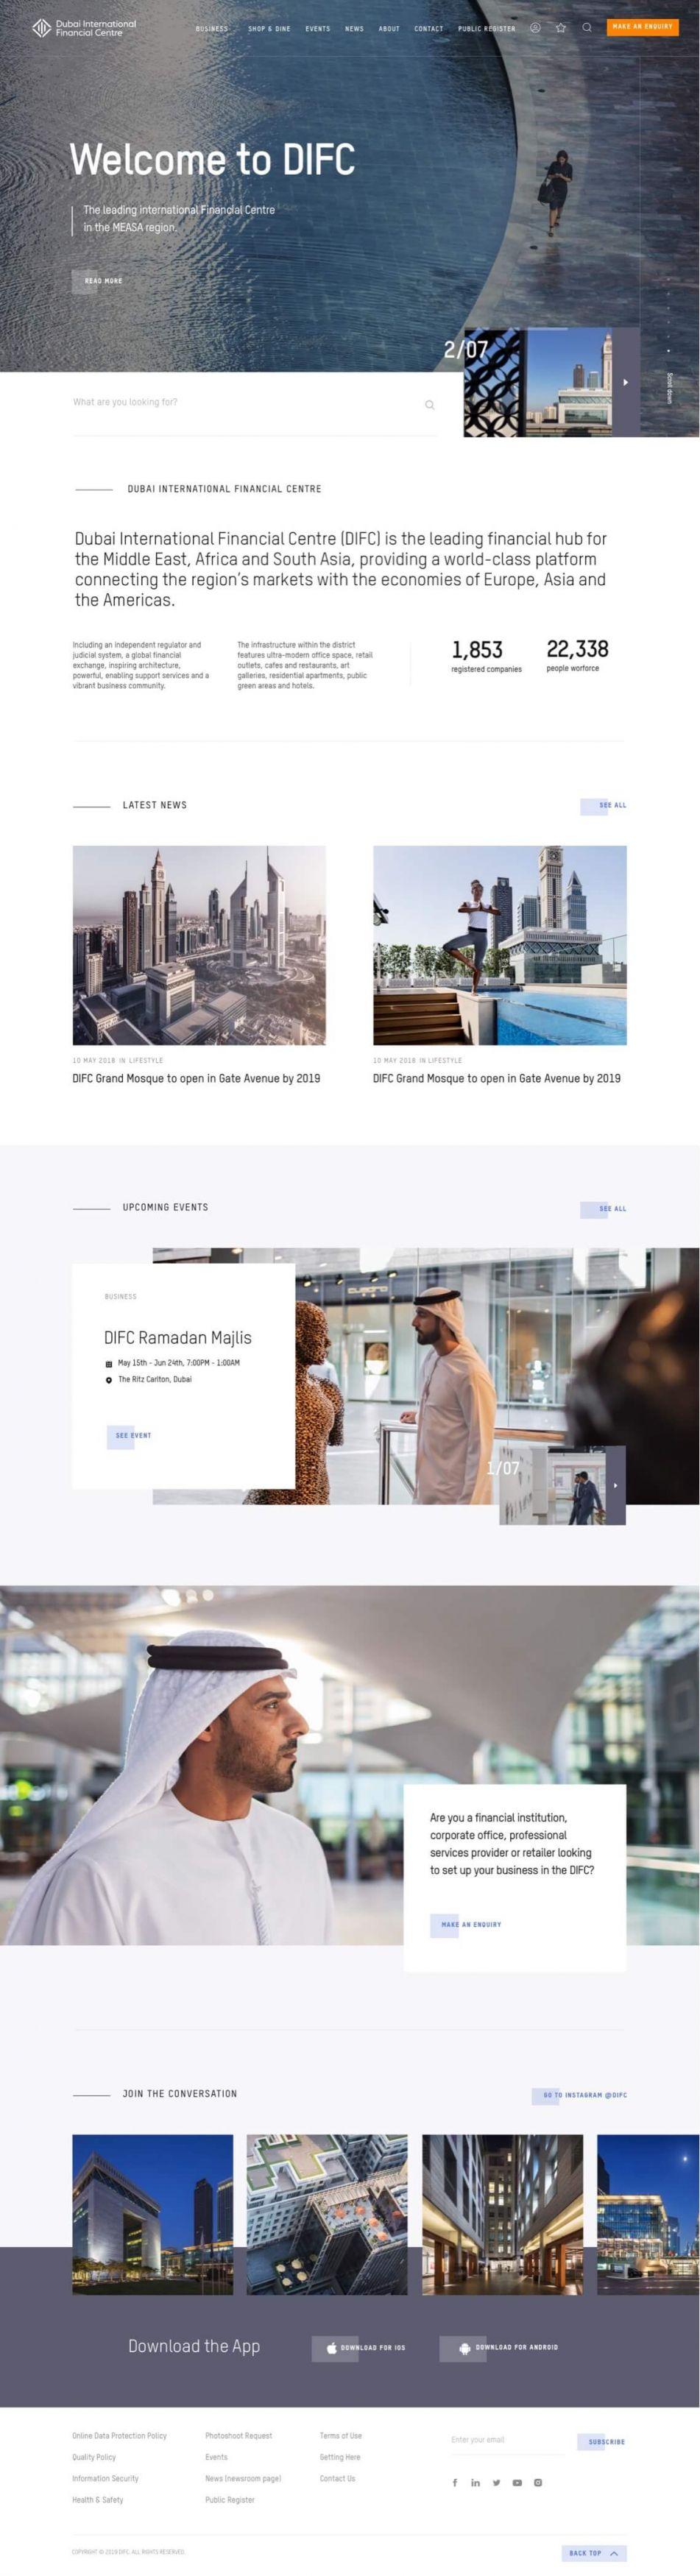 difc_Homepage.jpg